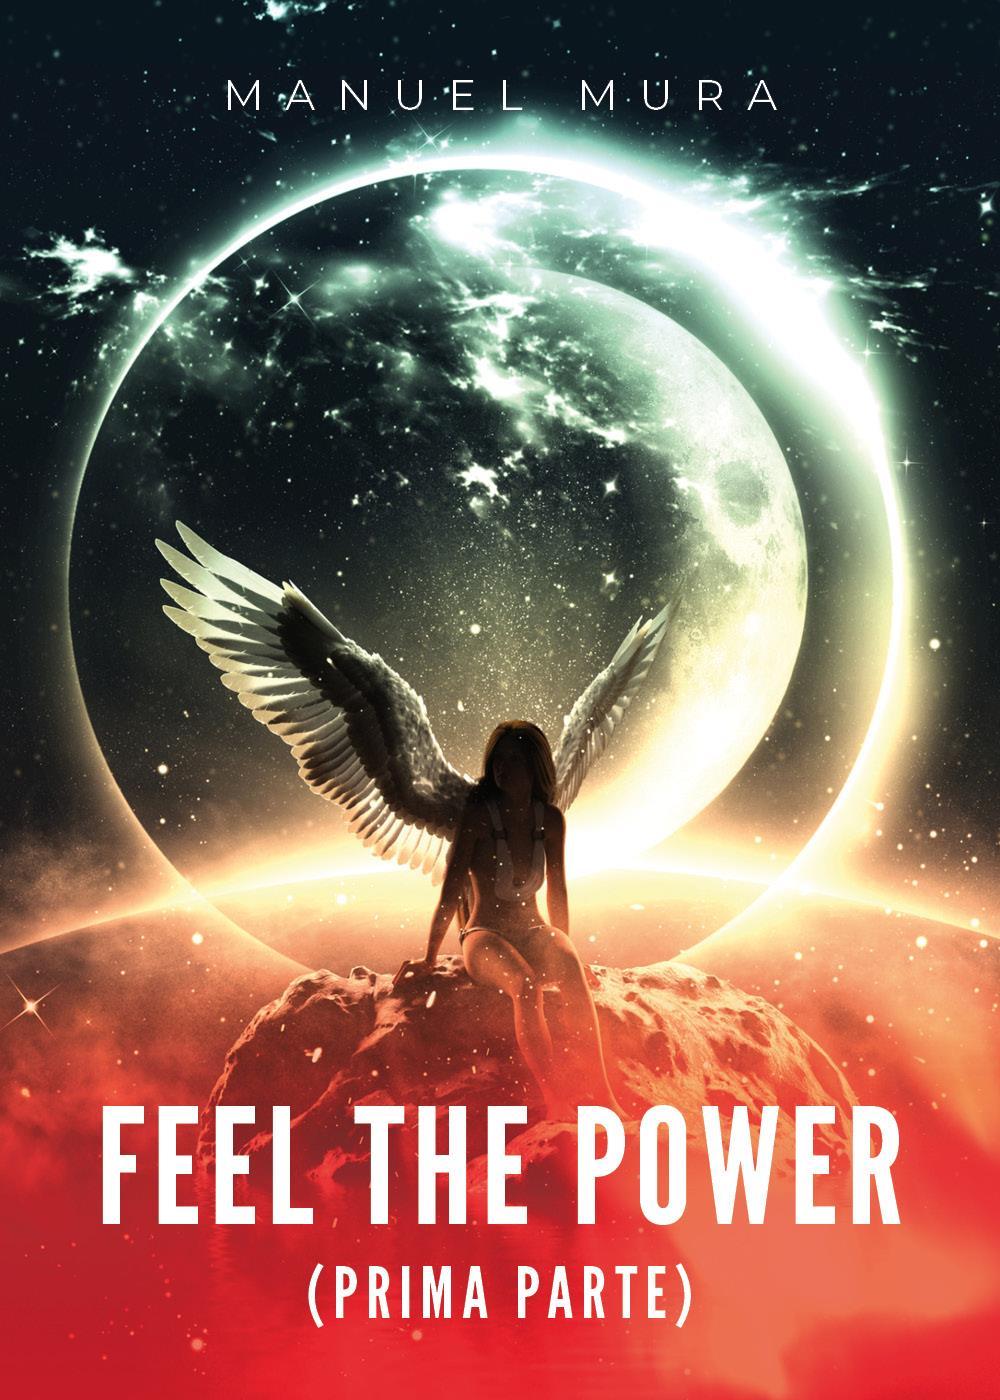 Feel the power (prima parte)